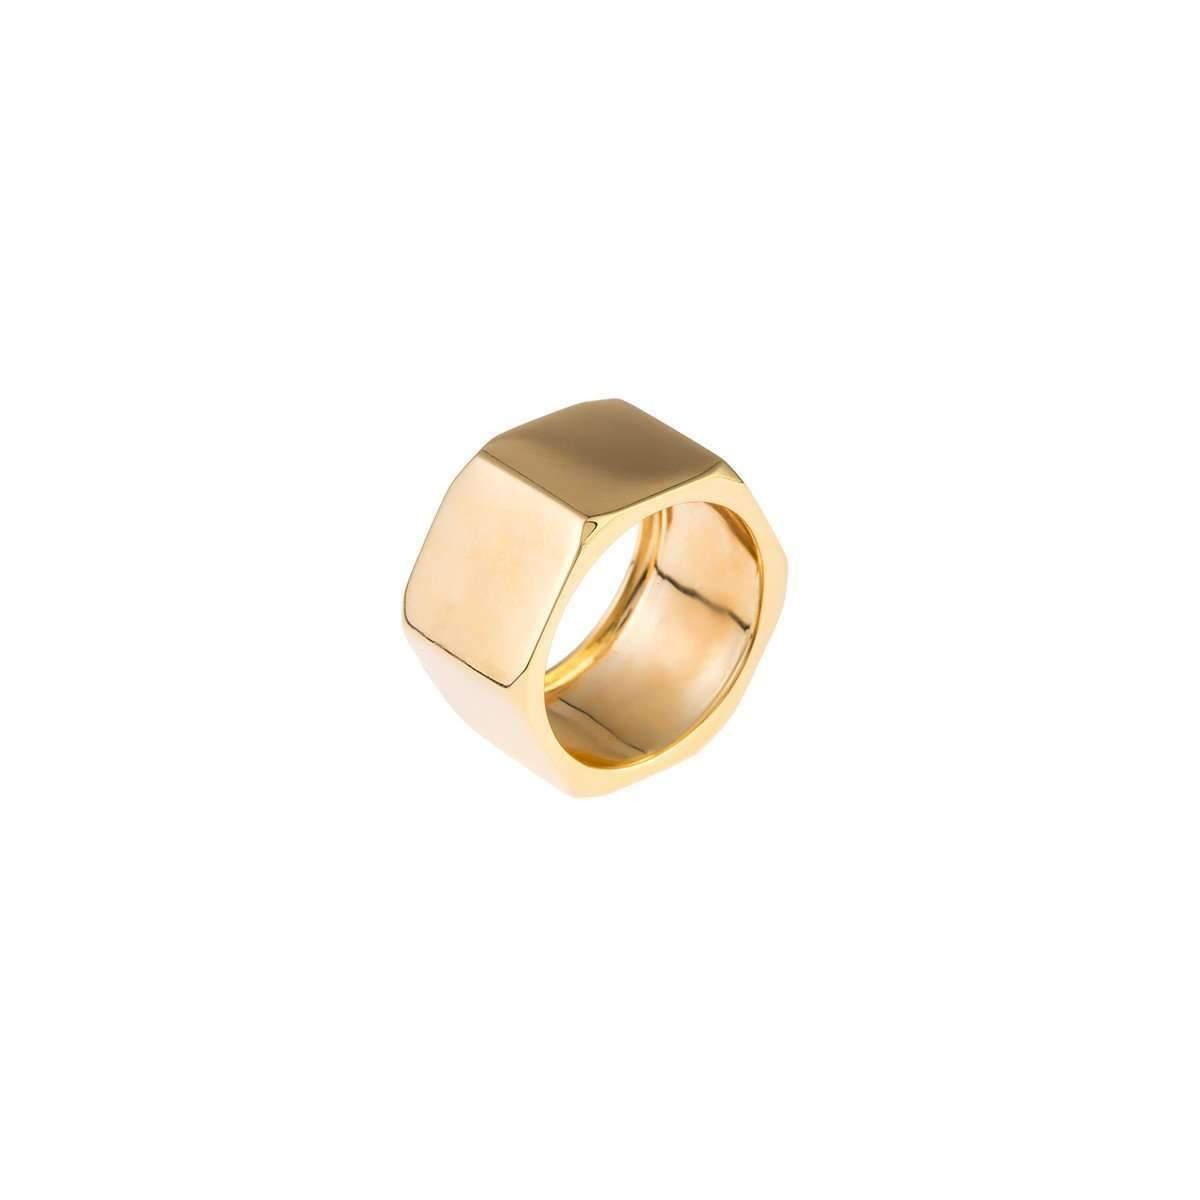 Joanna Laura Constantine Pave Nut Ring - UK M - US 6 - EU 52 3/4 lanzMjh